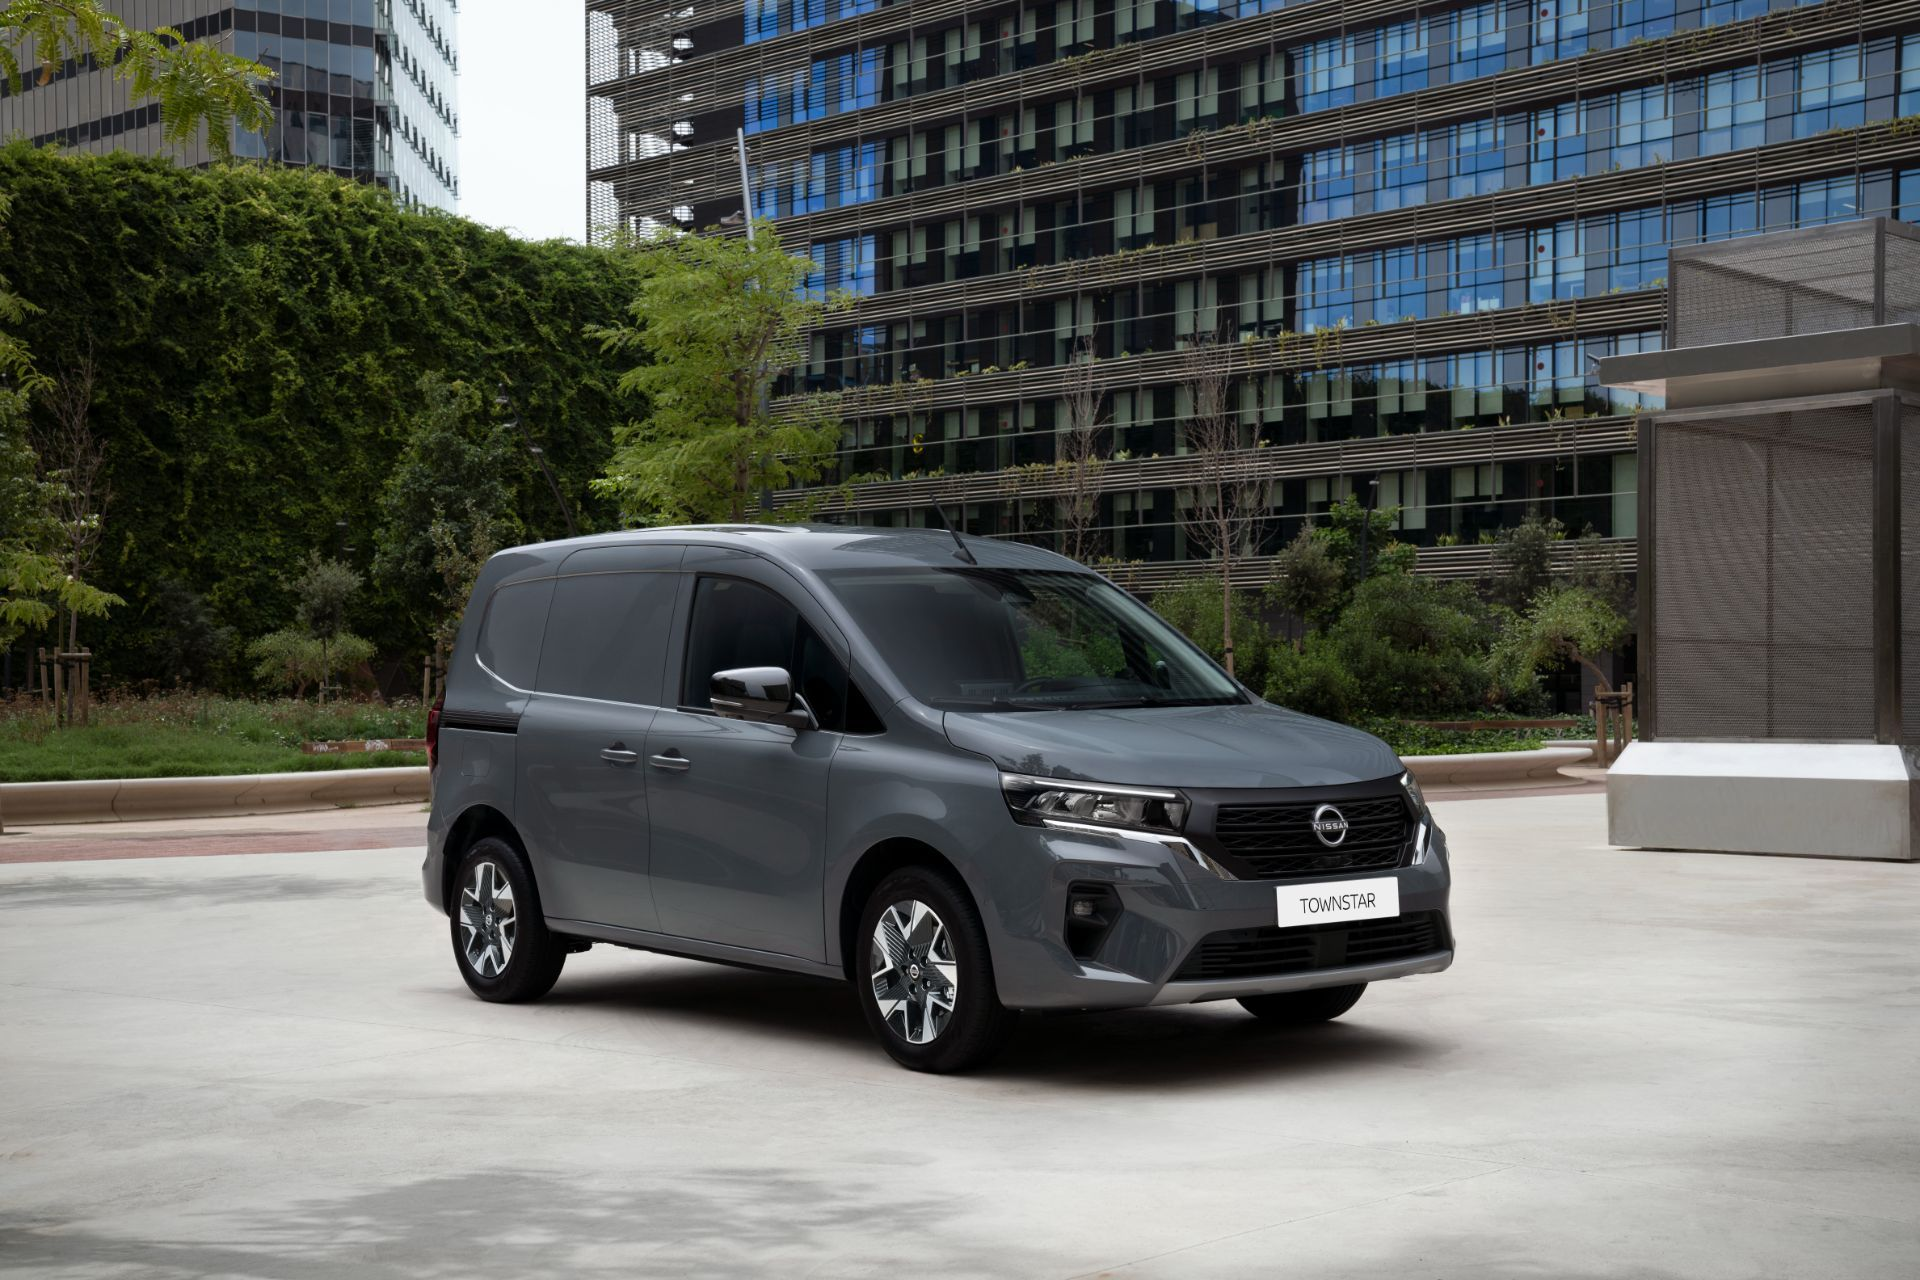 2022-Nissan-Townstar-petrol-van-dynamic-8